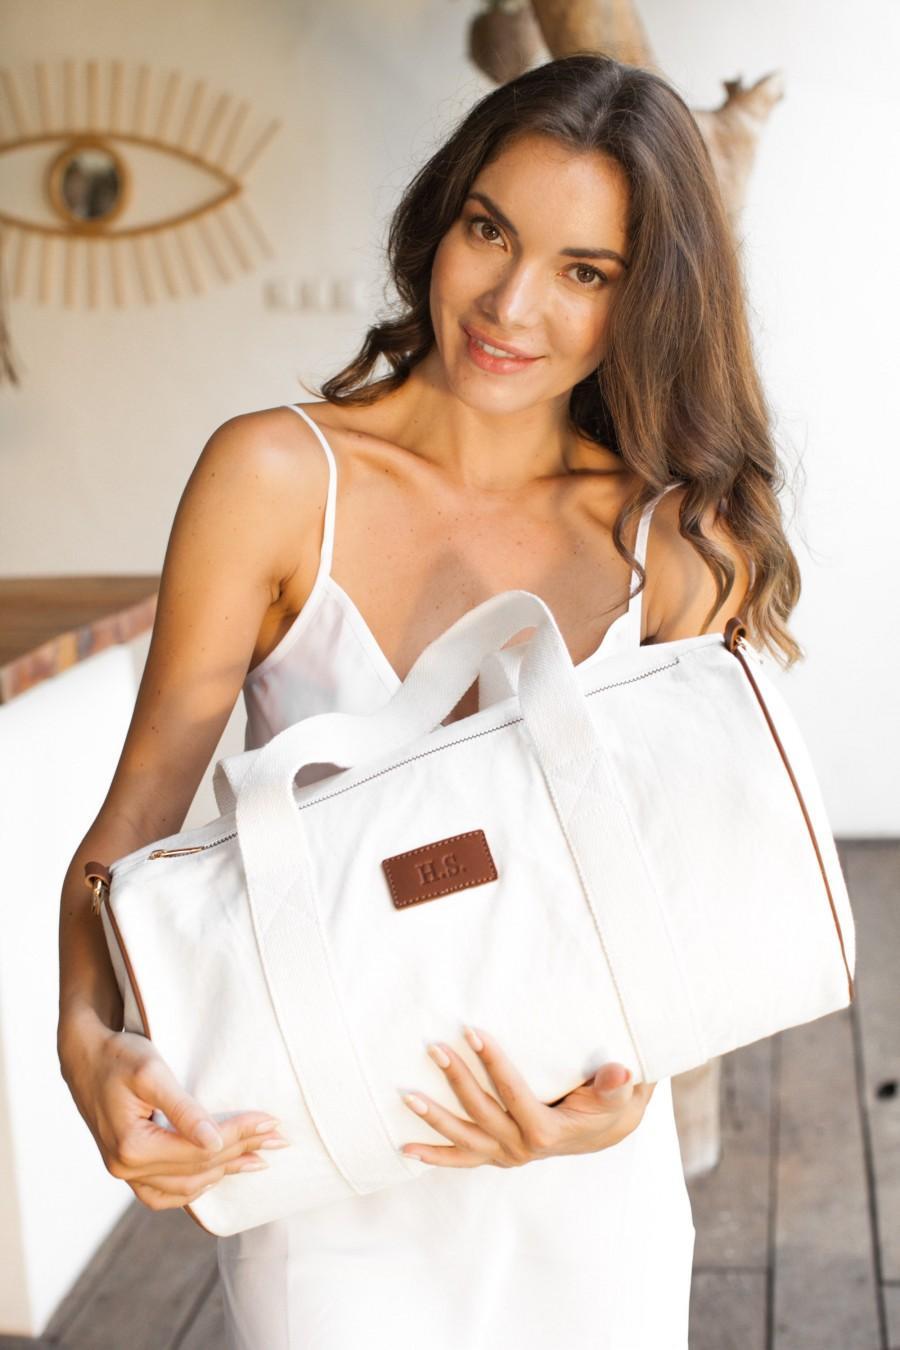 Wedding - Monogram Duffle Bag Baby Bag Hospital Bag Personalized Baby Shower Gift Monogrammed Weekender Bags Bridesmaid gift